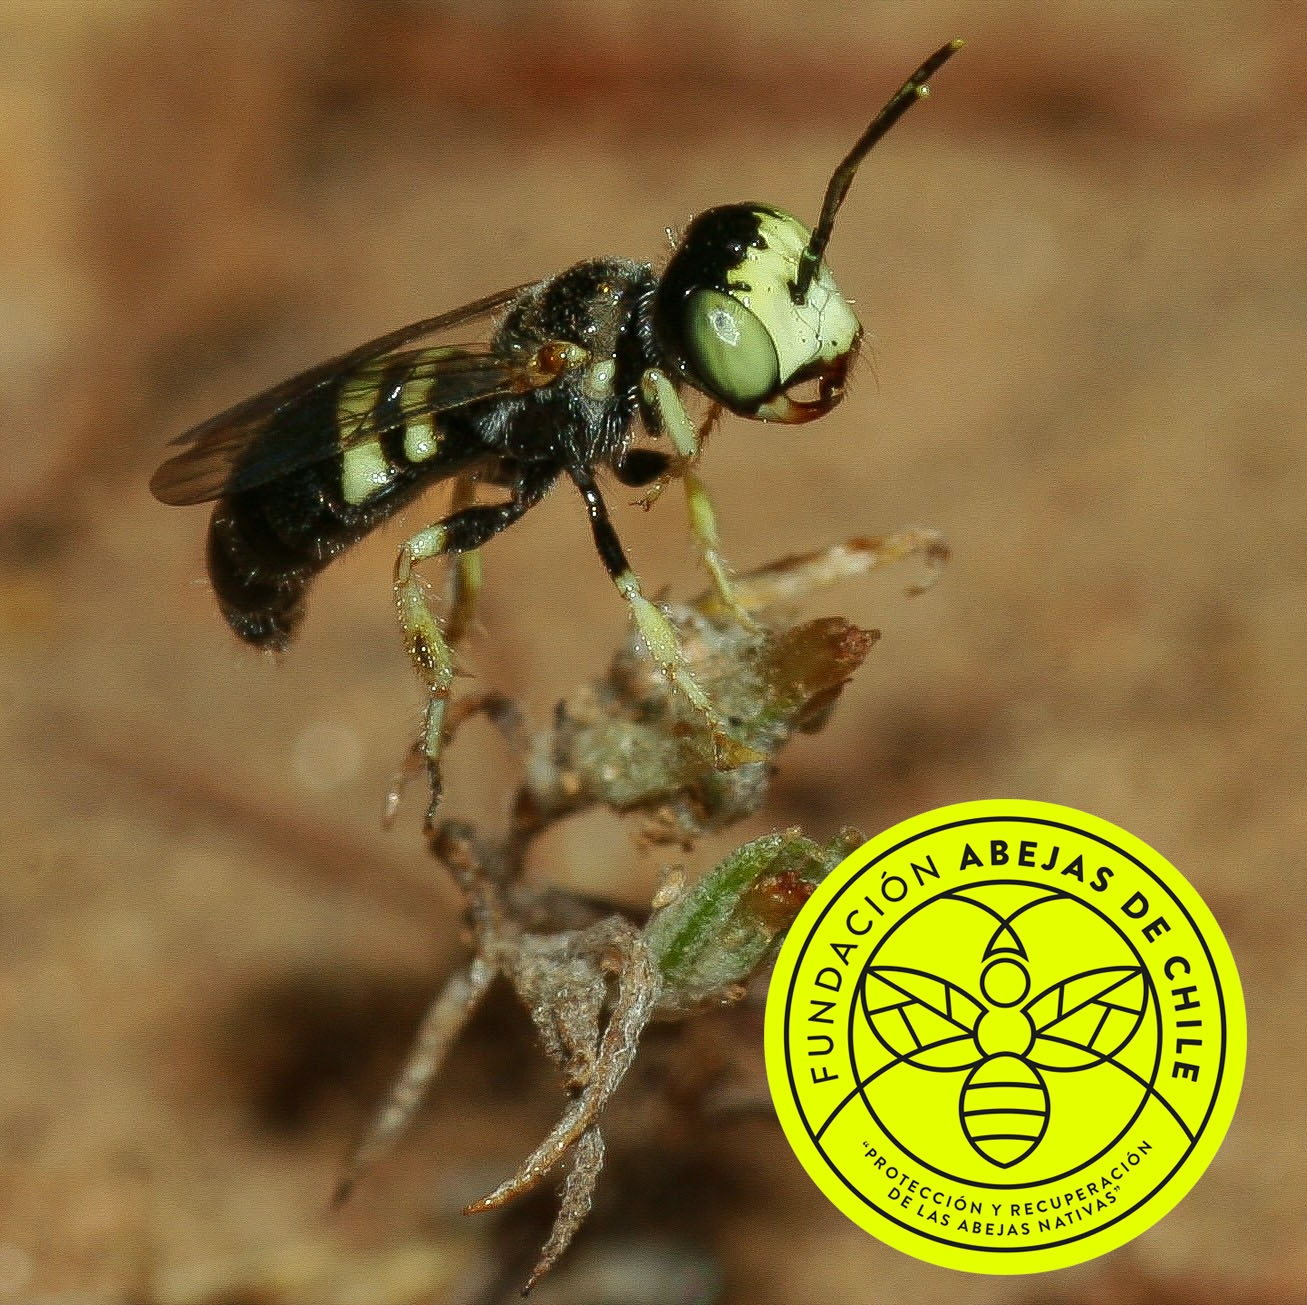 Liphanthus-sabulosus-Pablo-Vial-Valdés-Abejas-abeja-nativa-endémica-chile-wild-bee-de-bees-hormiga-polinizacion